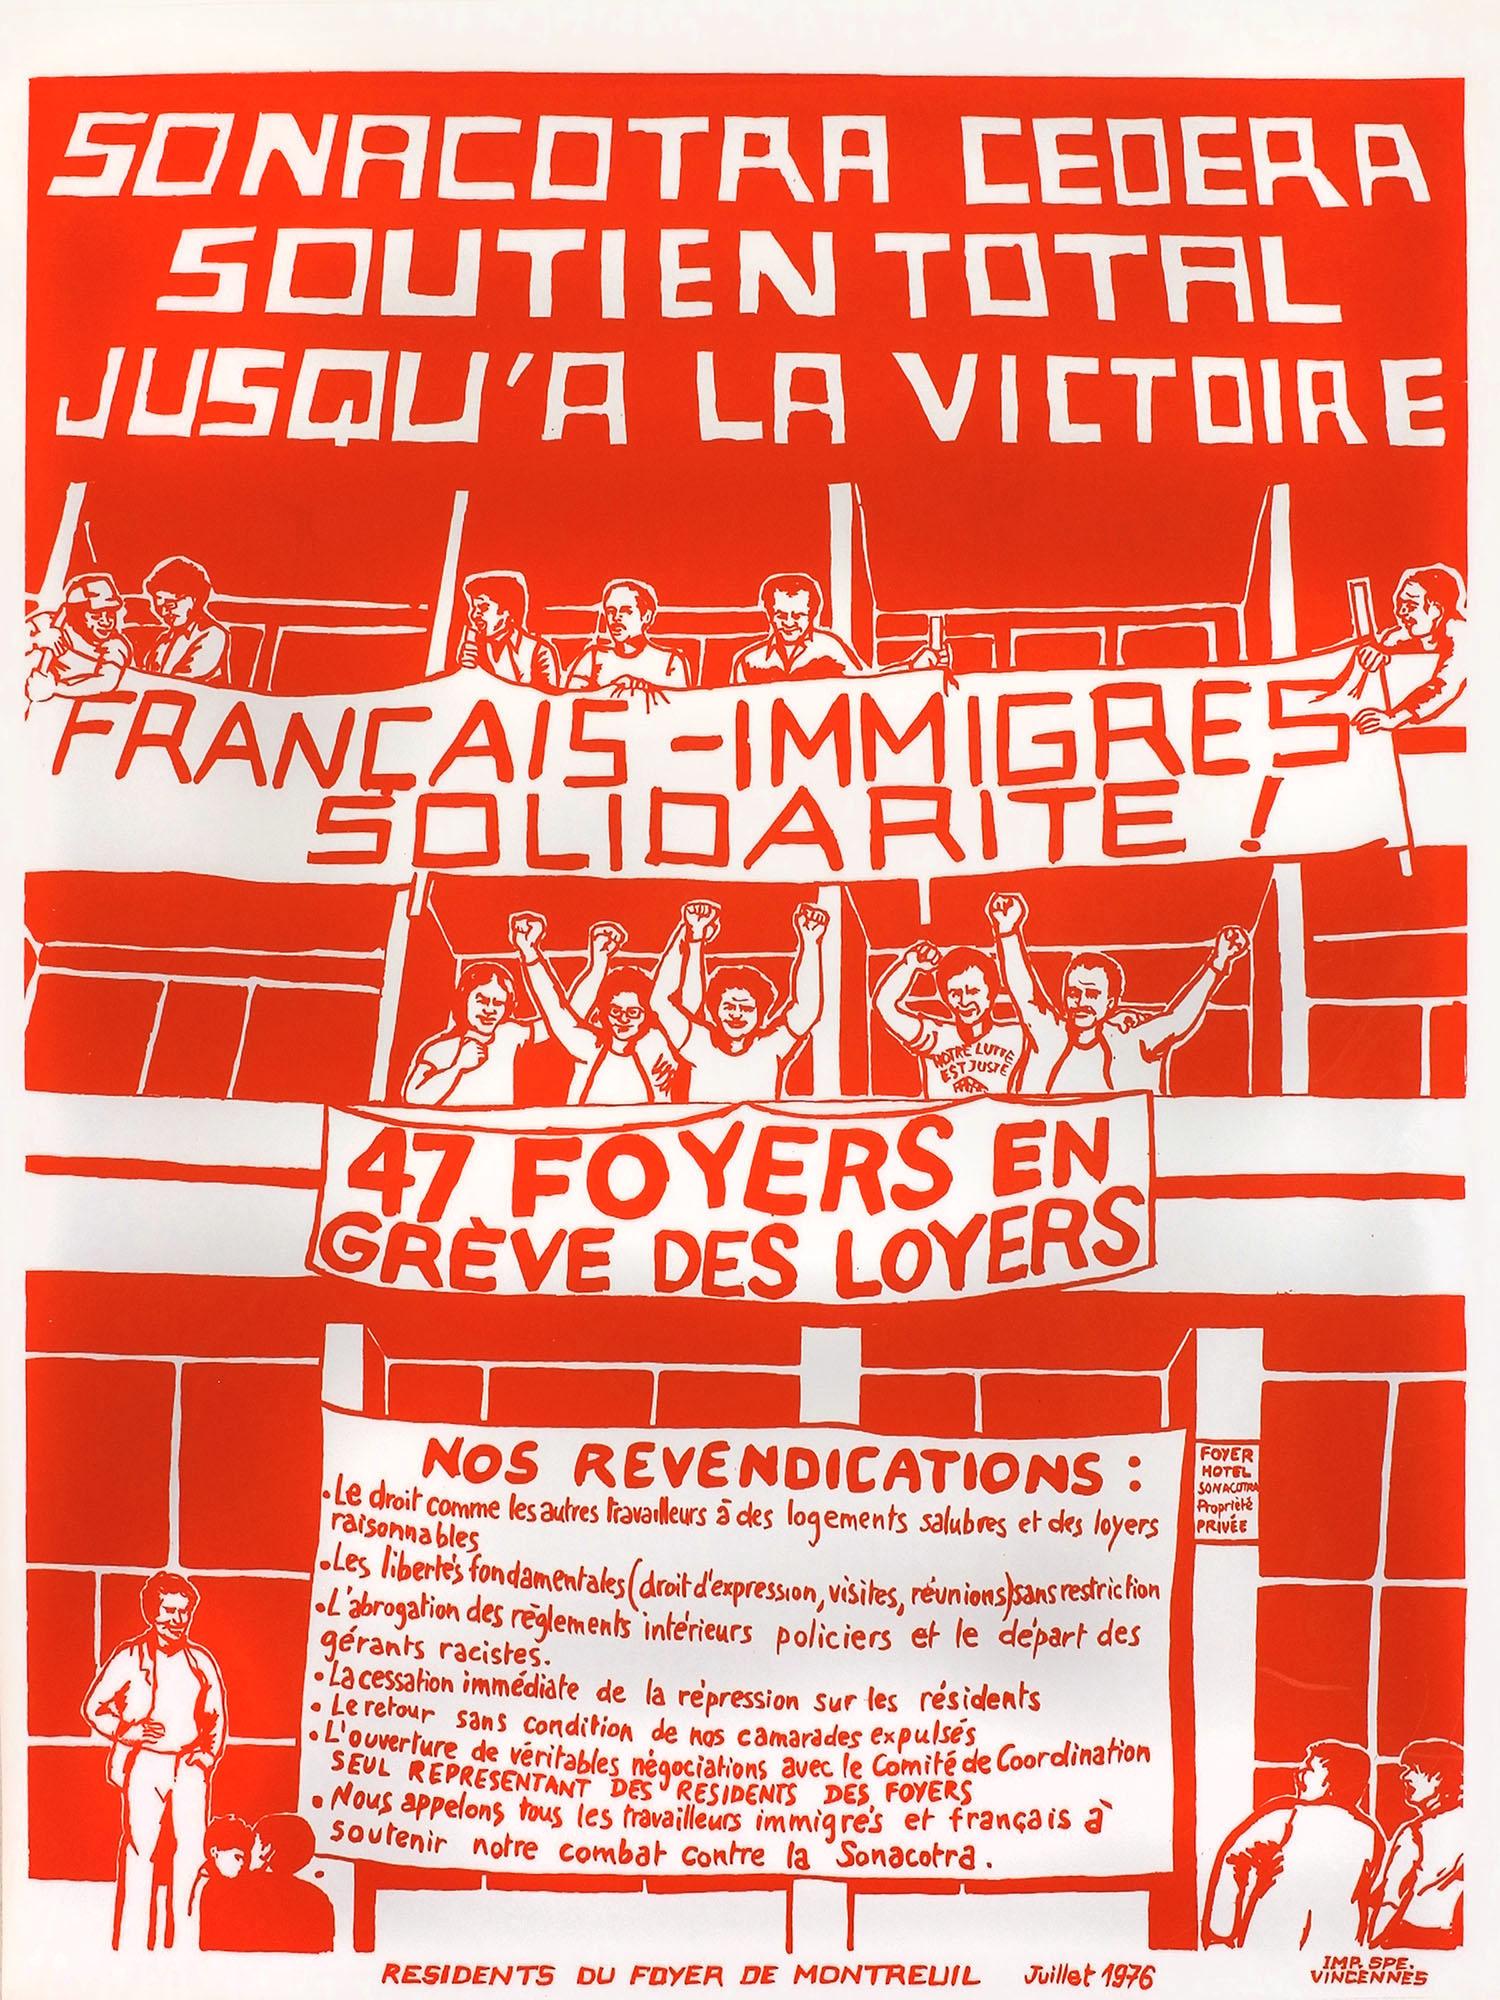 sonacotra montreuil 1976 2000